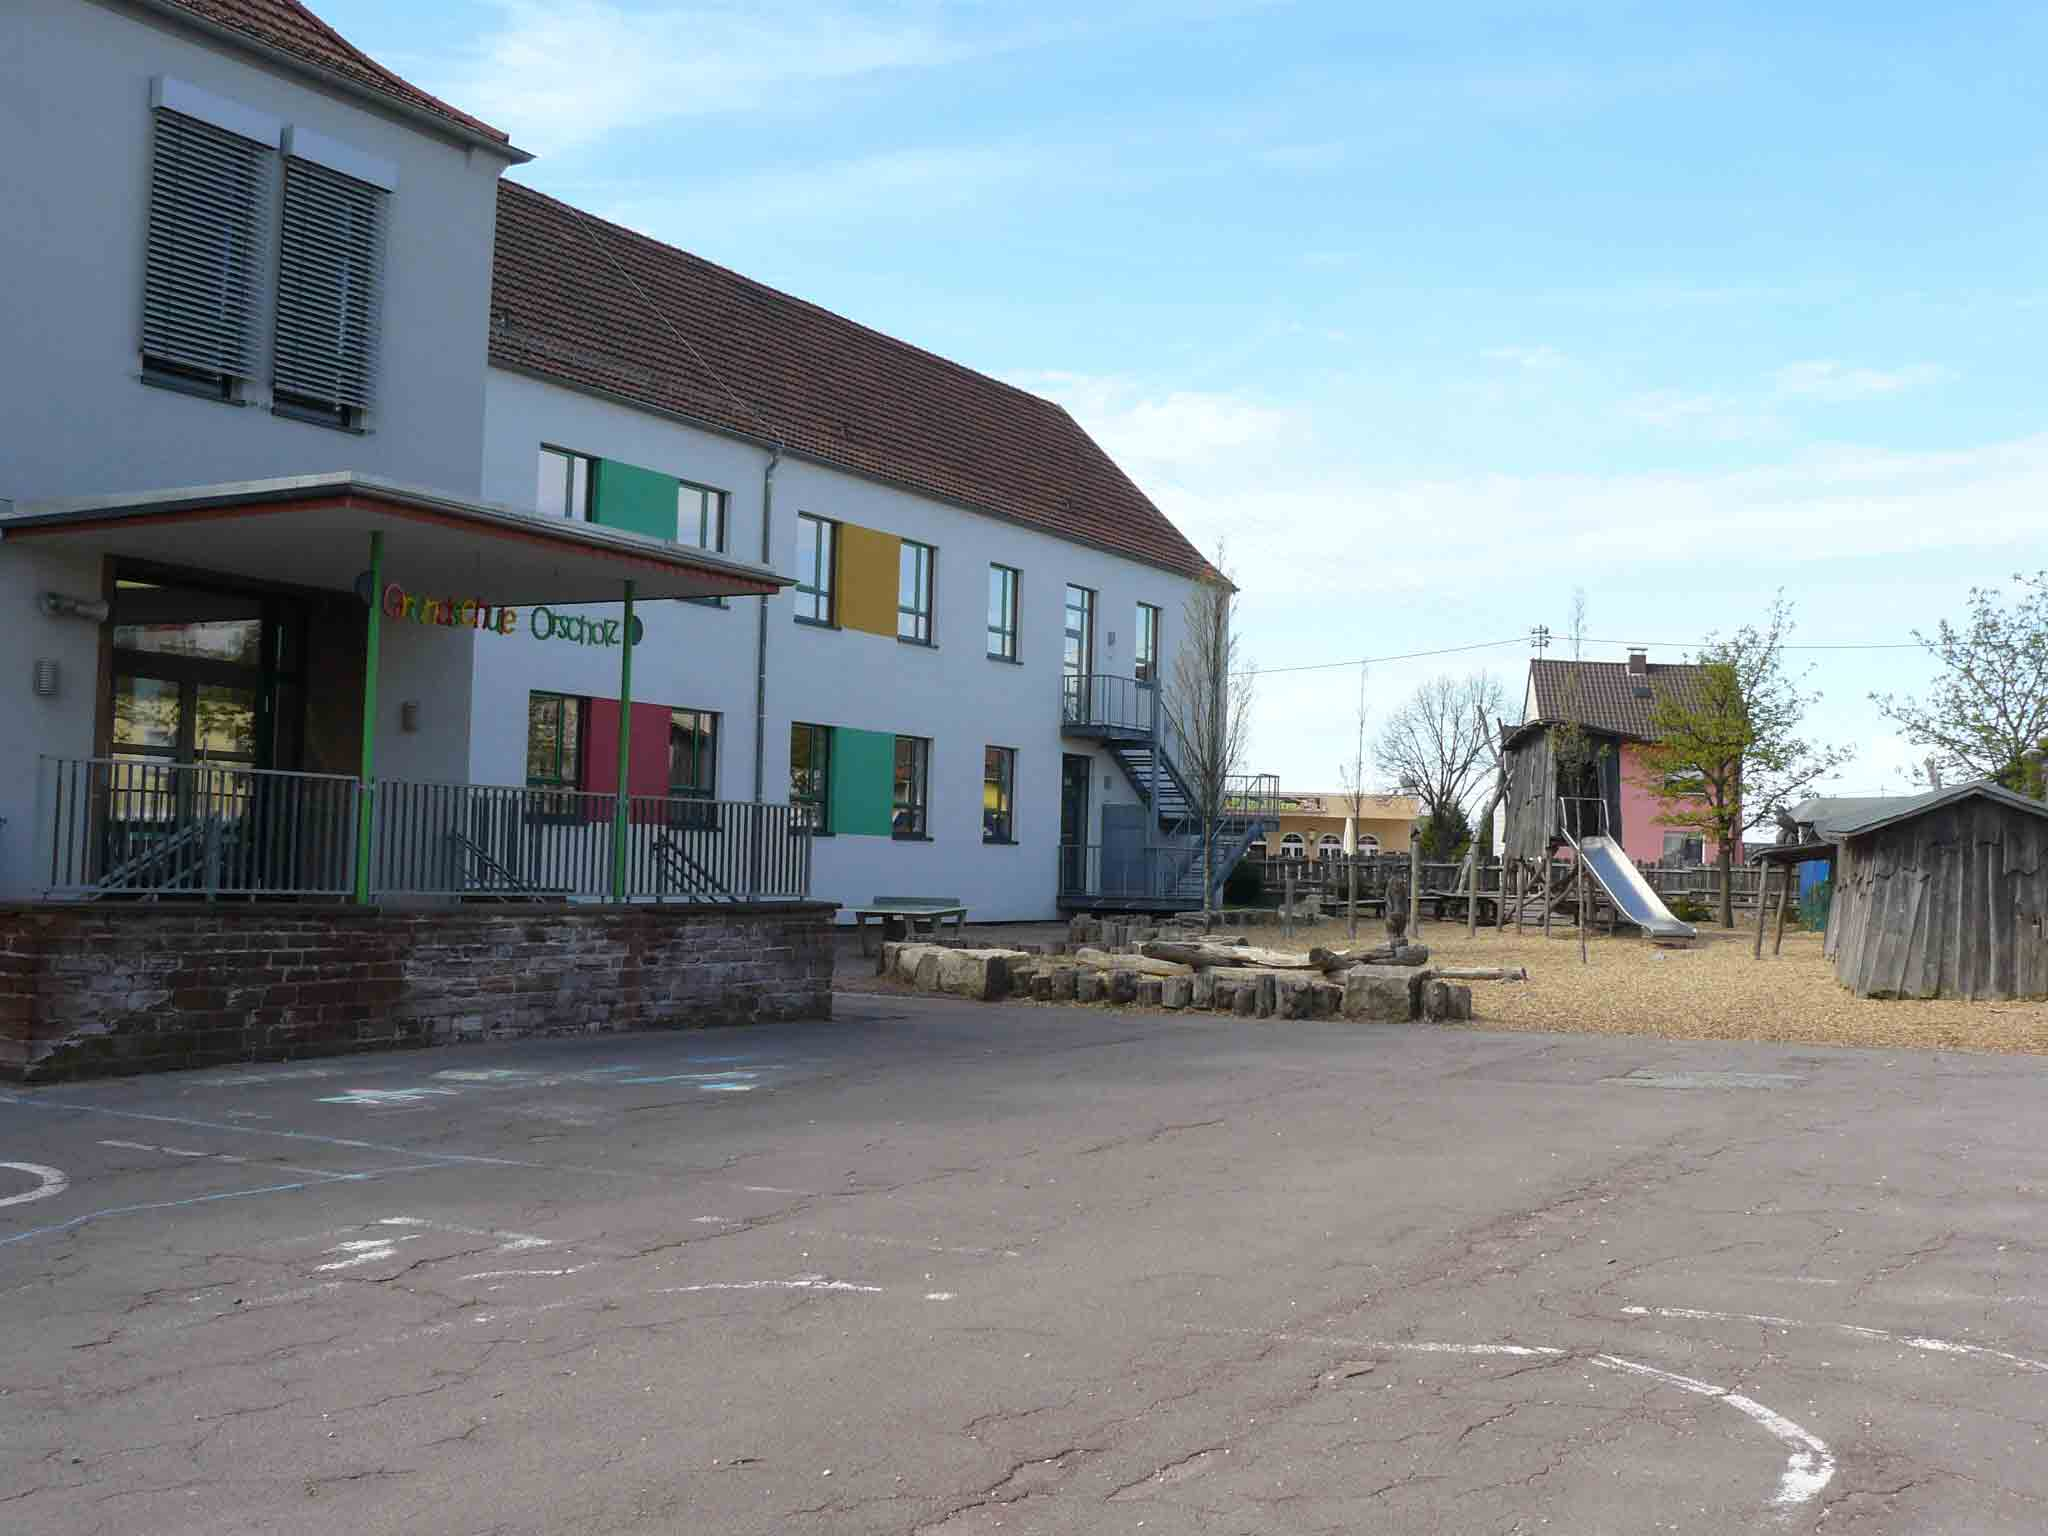 Grundschule-Orscholz